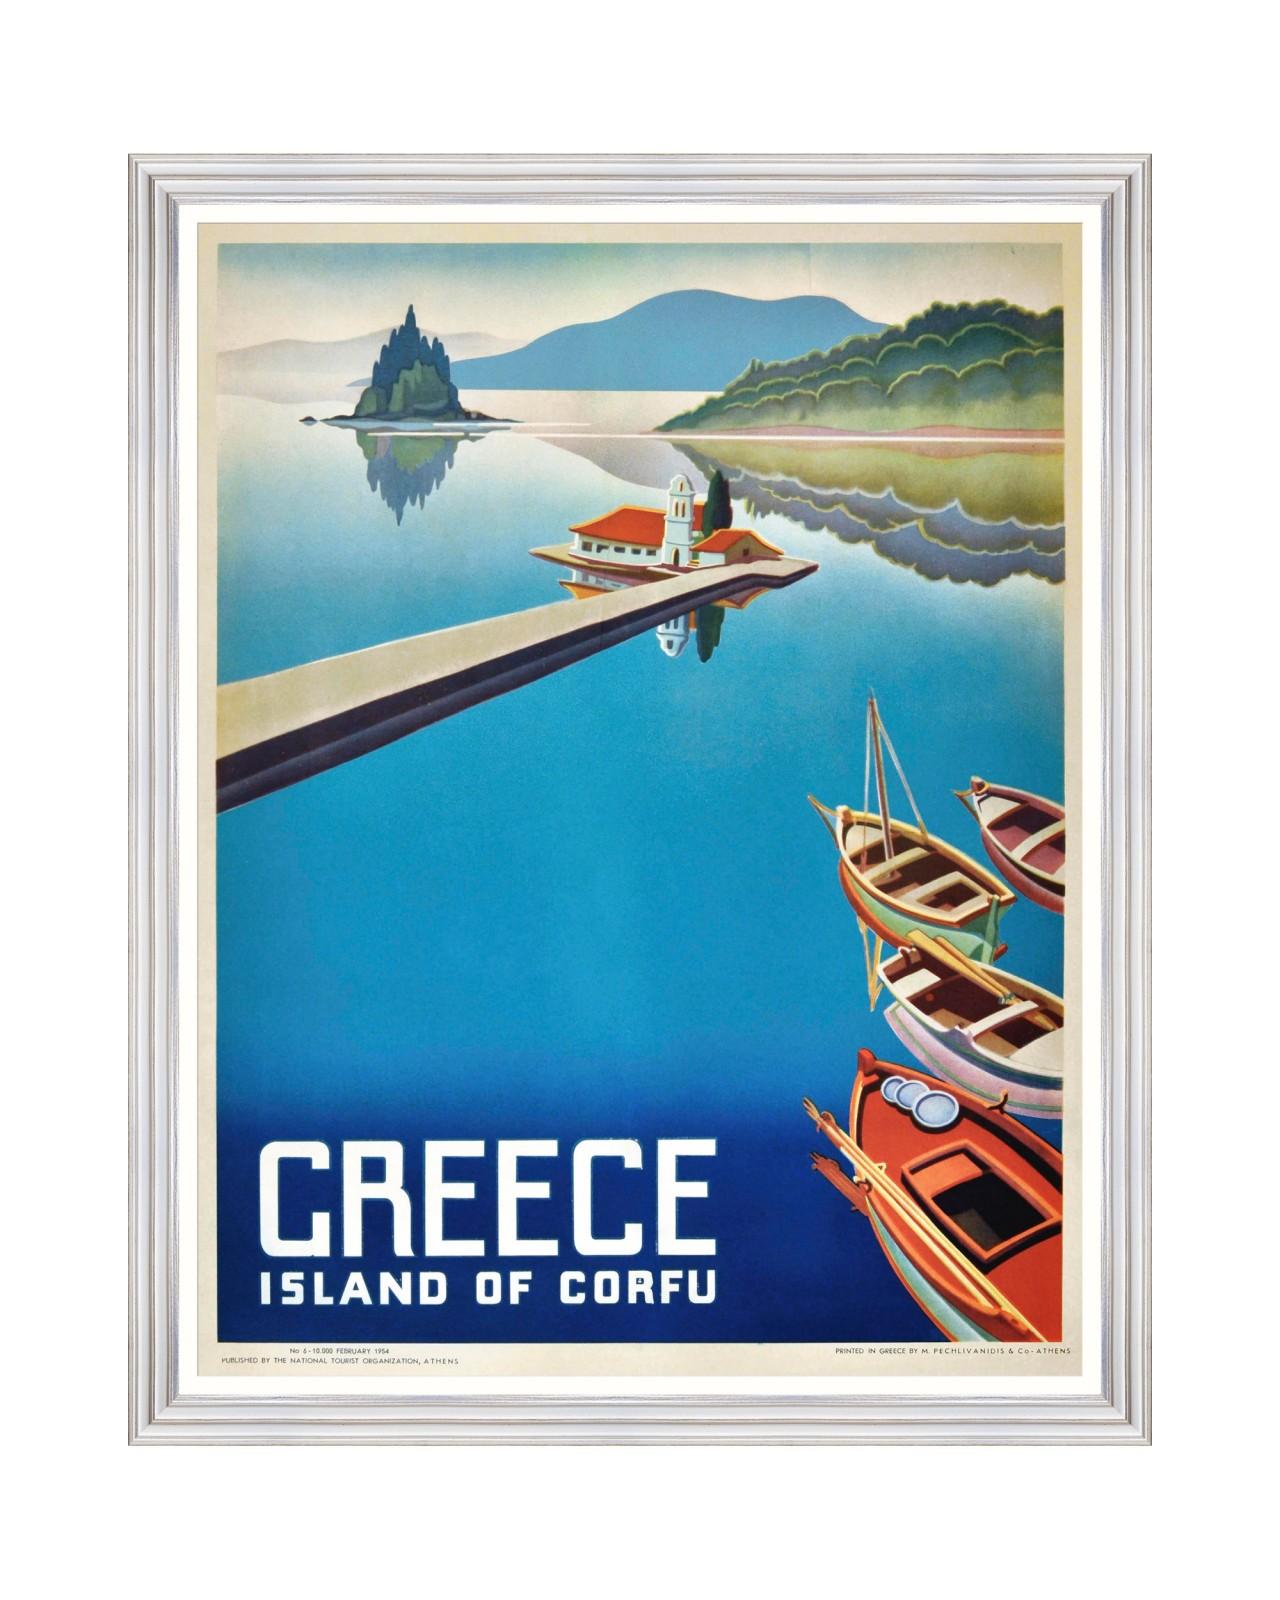 GREECE TRAVELS POSTERS - ISLAND OF CORFU Framed Art